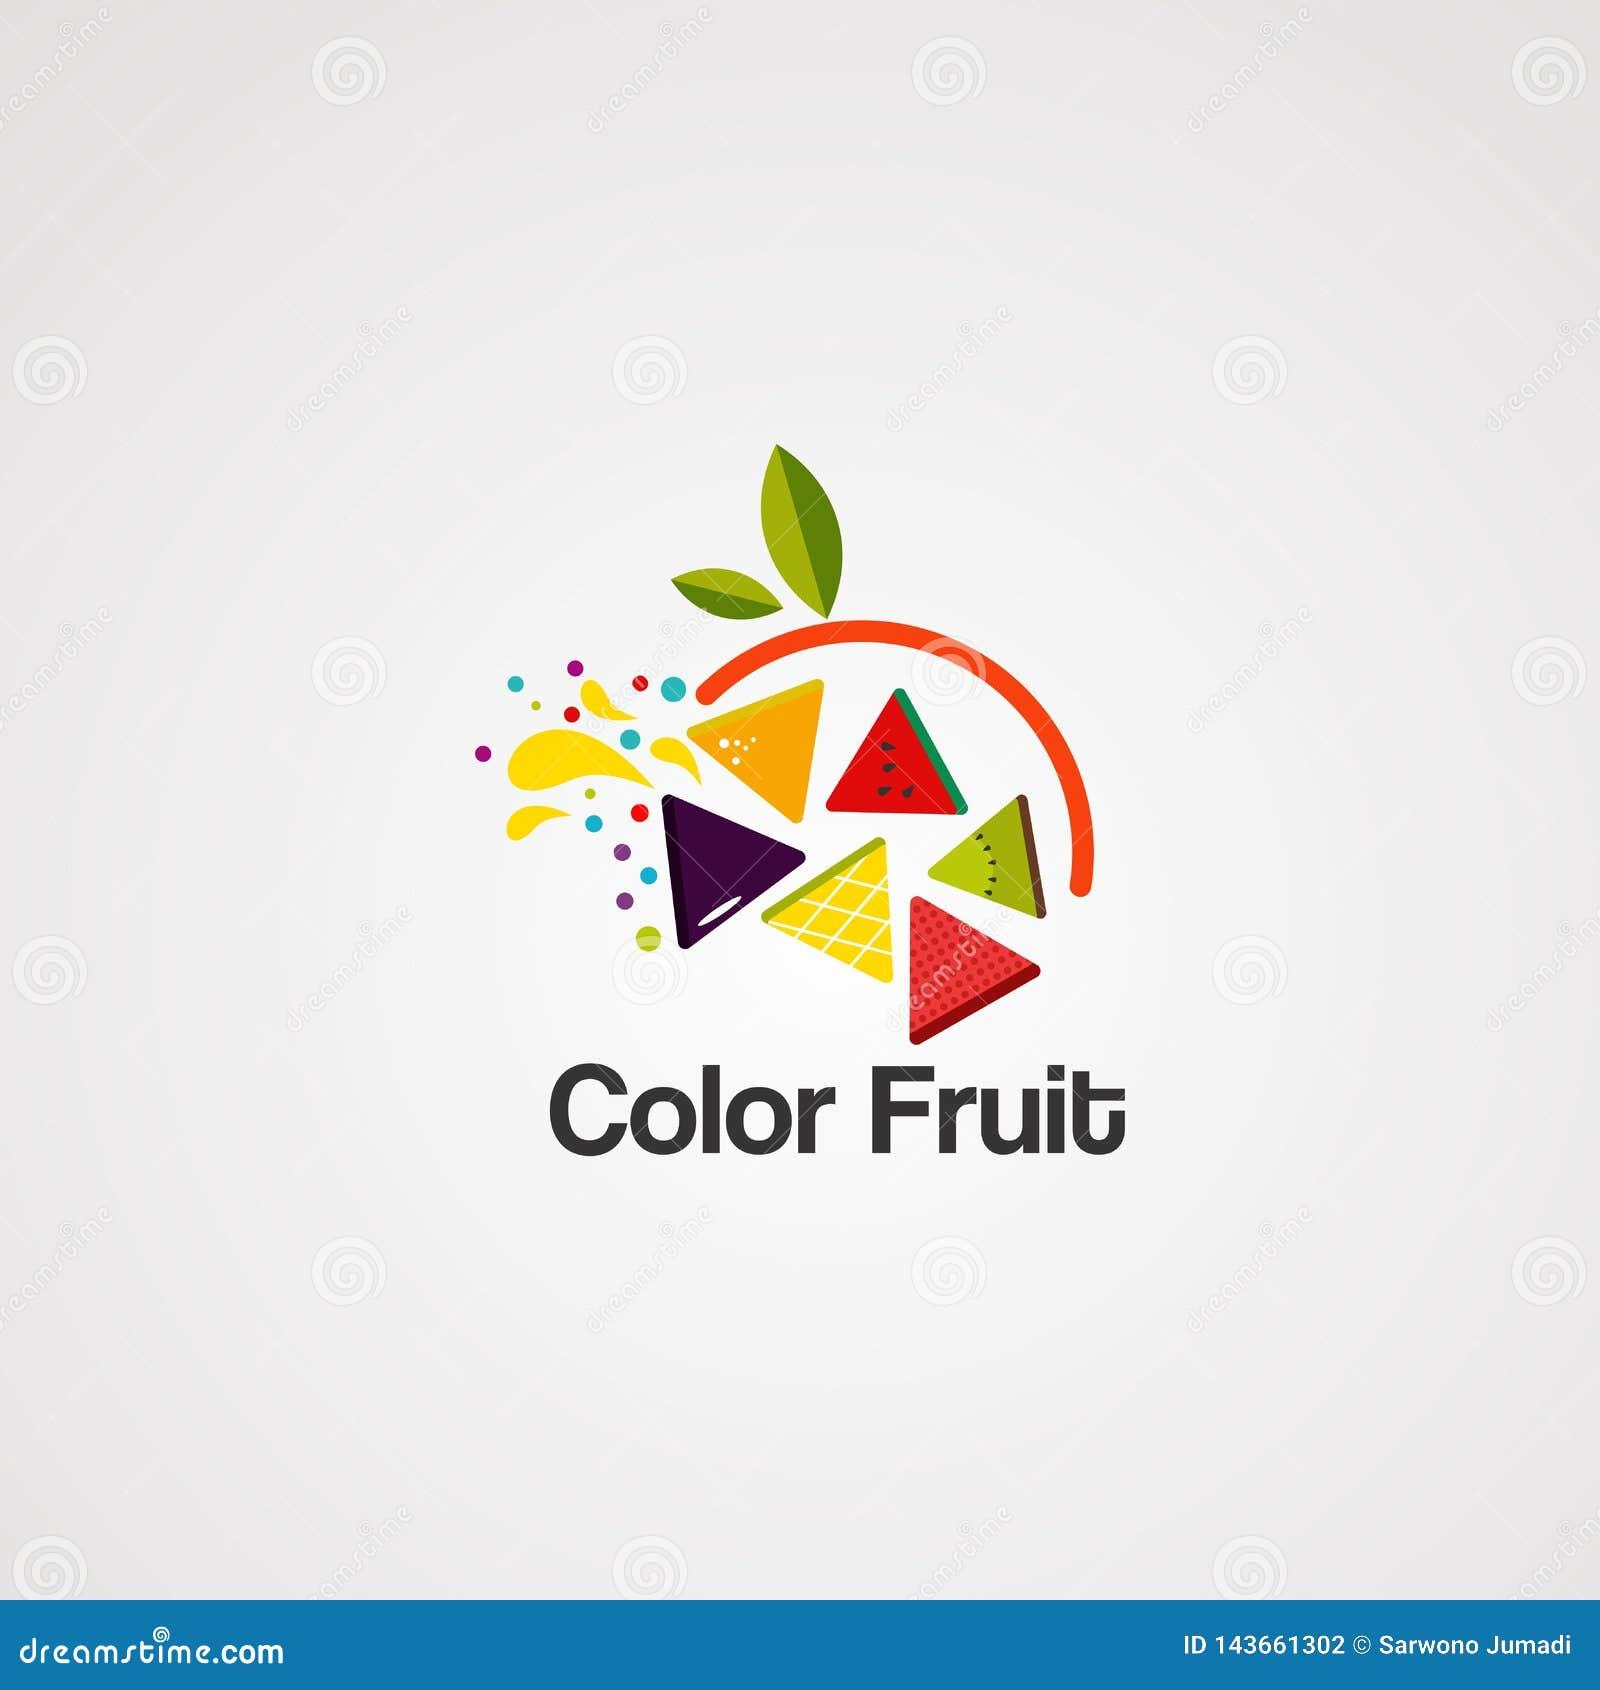 Fruto colorido no circuito com vetor, ícone, elemento, e molde do logotipo da folha para a empresa